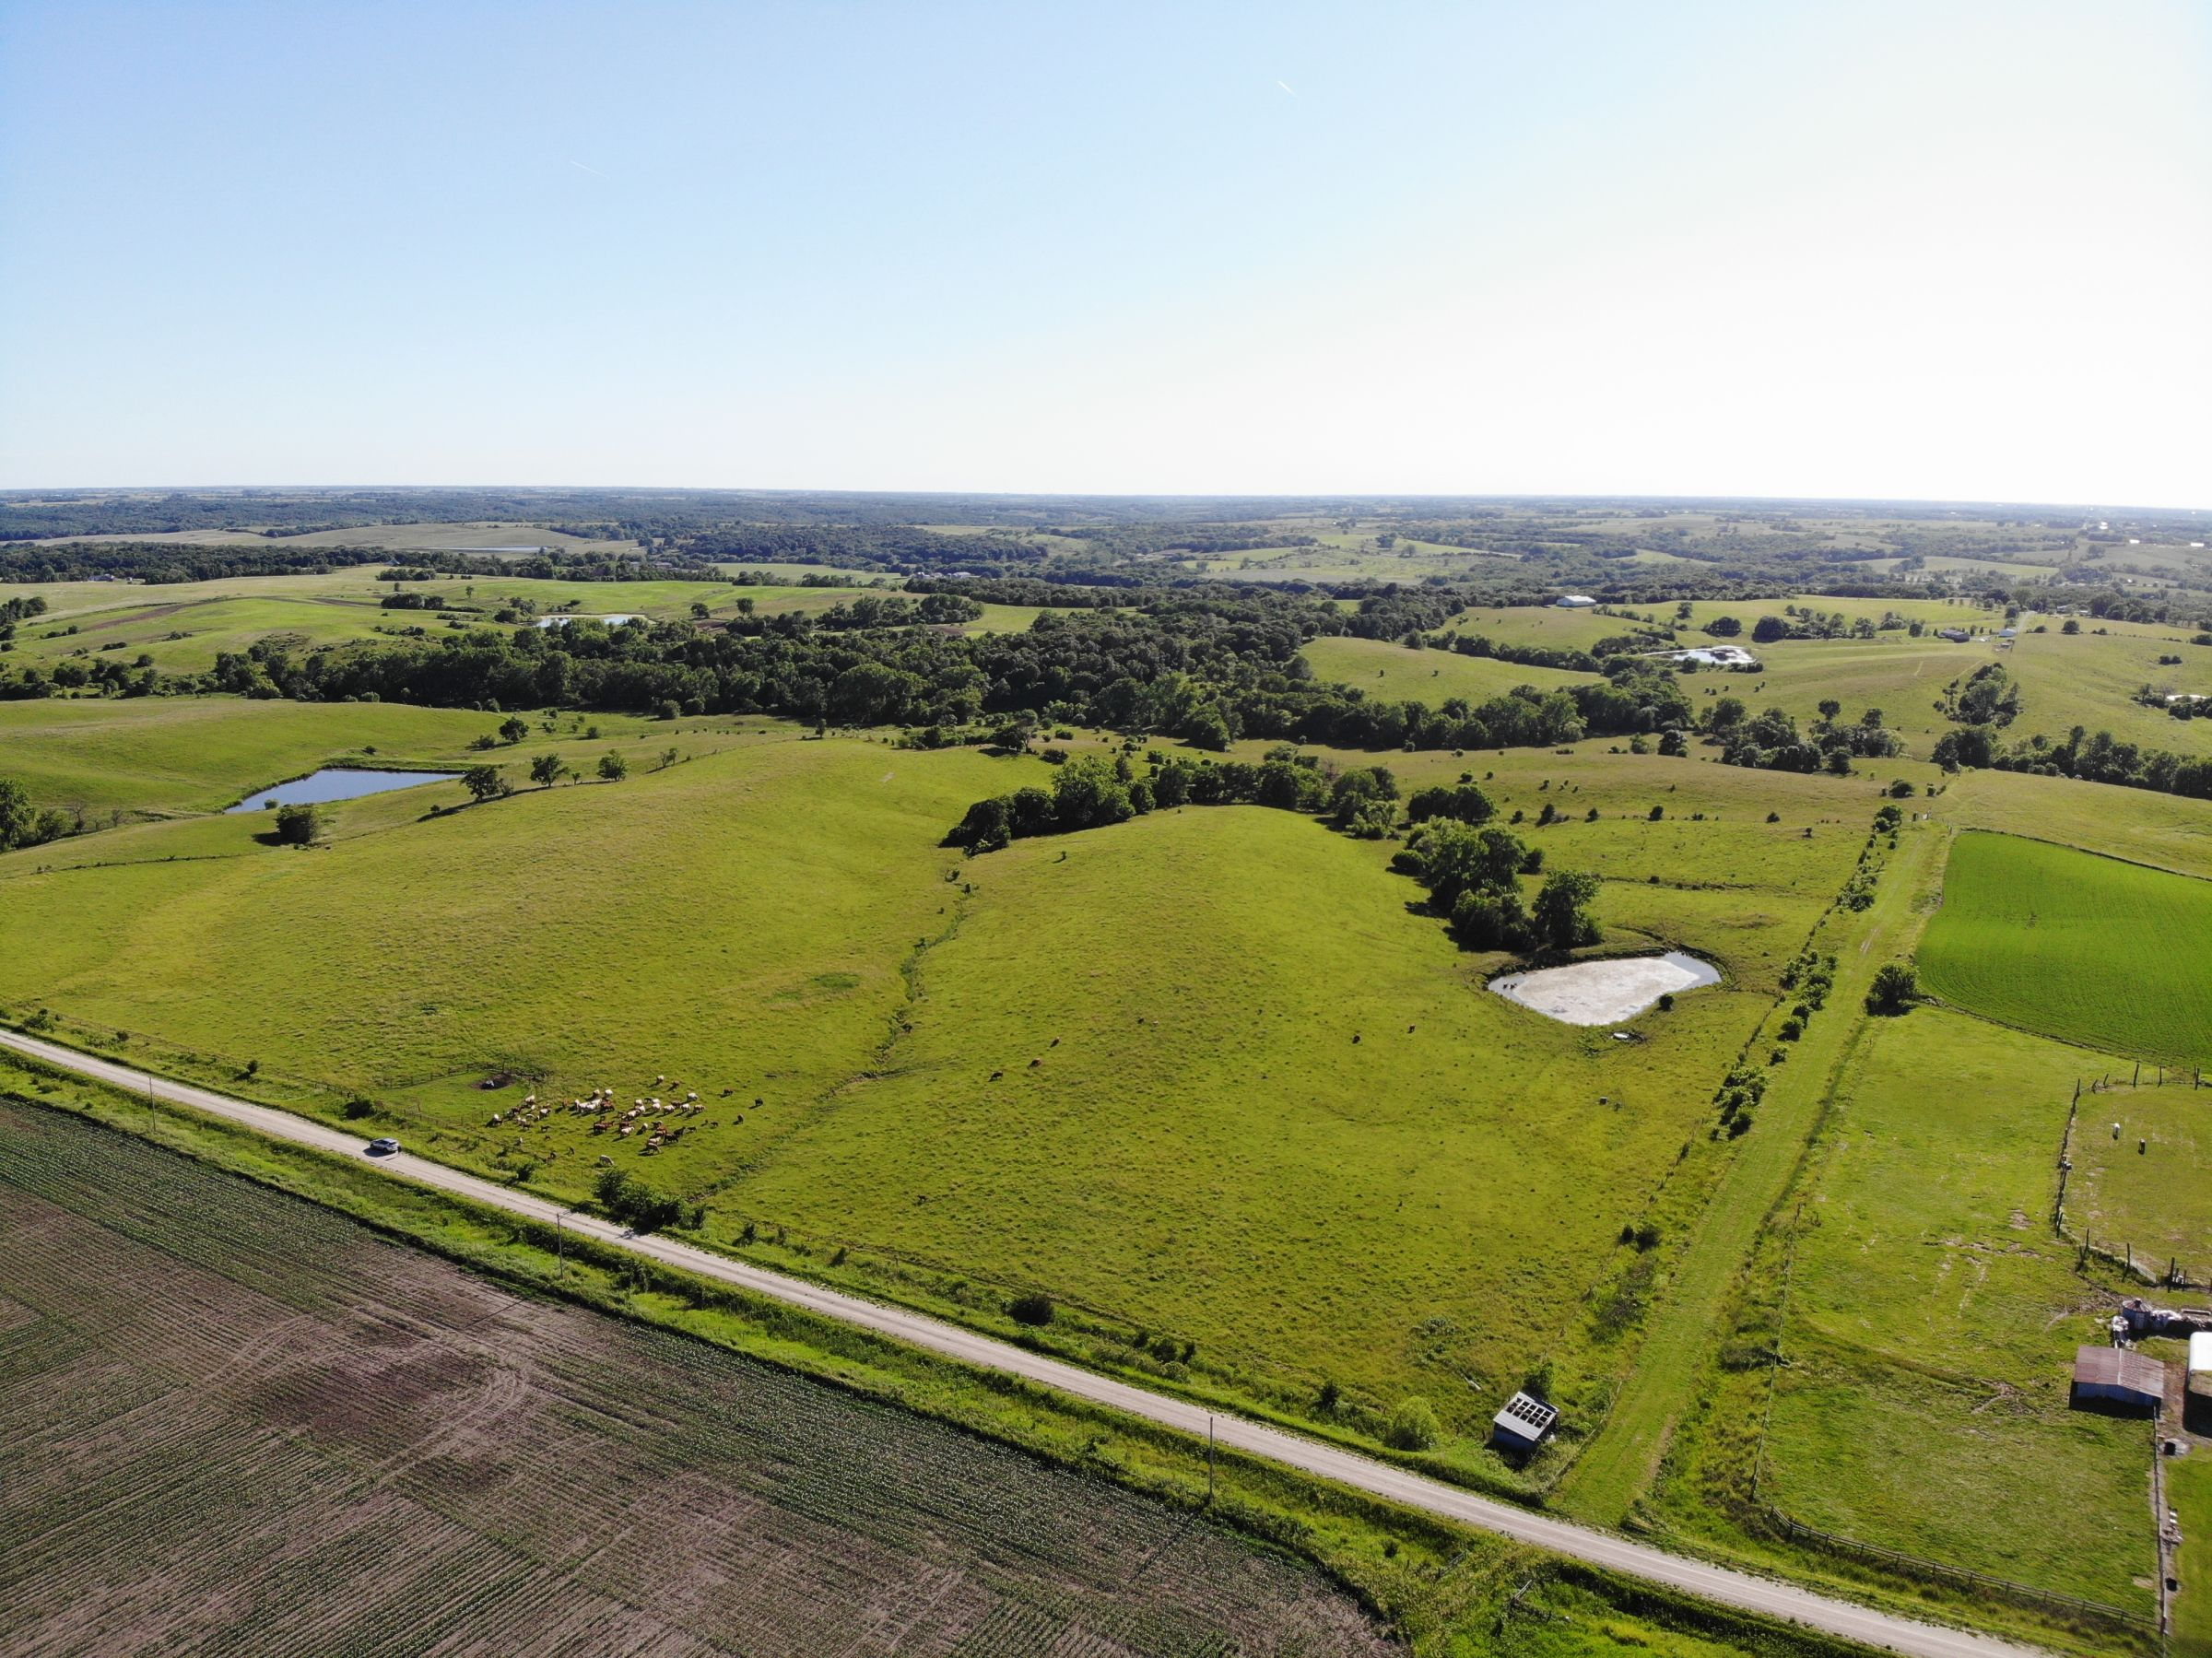 land-warren-county-iowa-60-acres-listing-number-15033-1-2020-06-15-160702.jpg